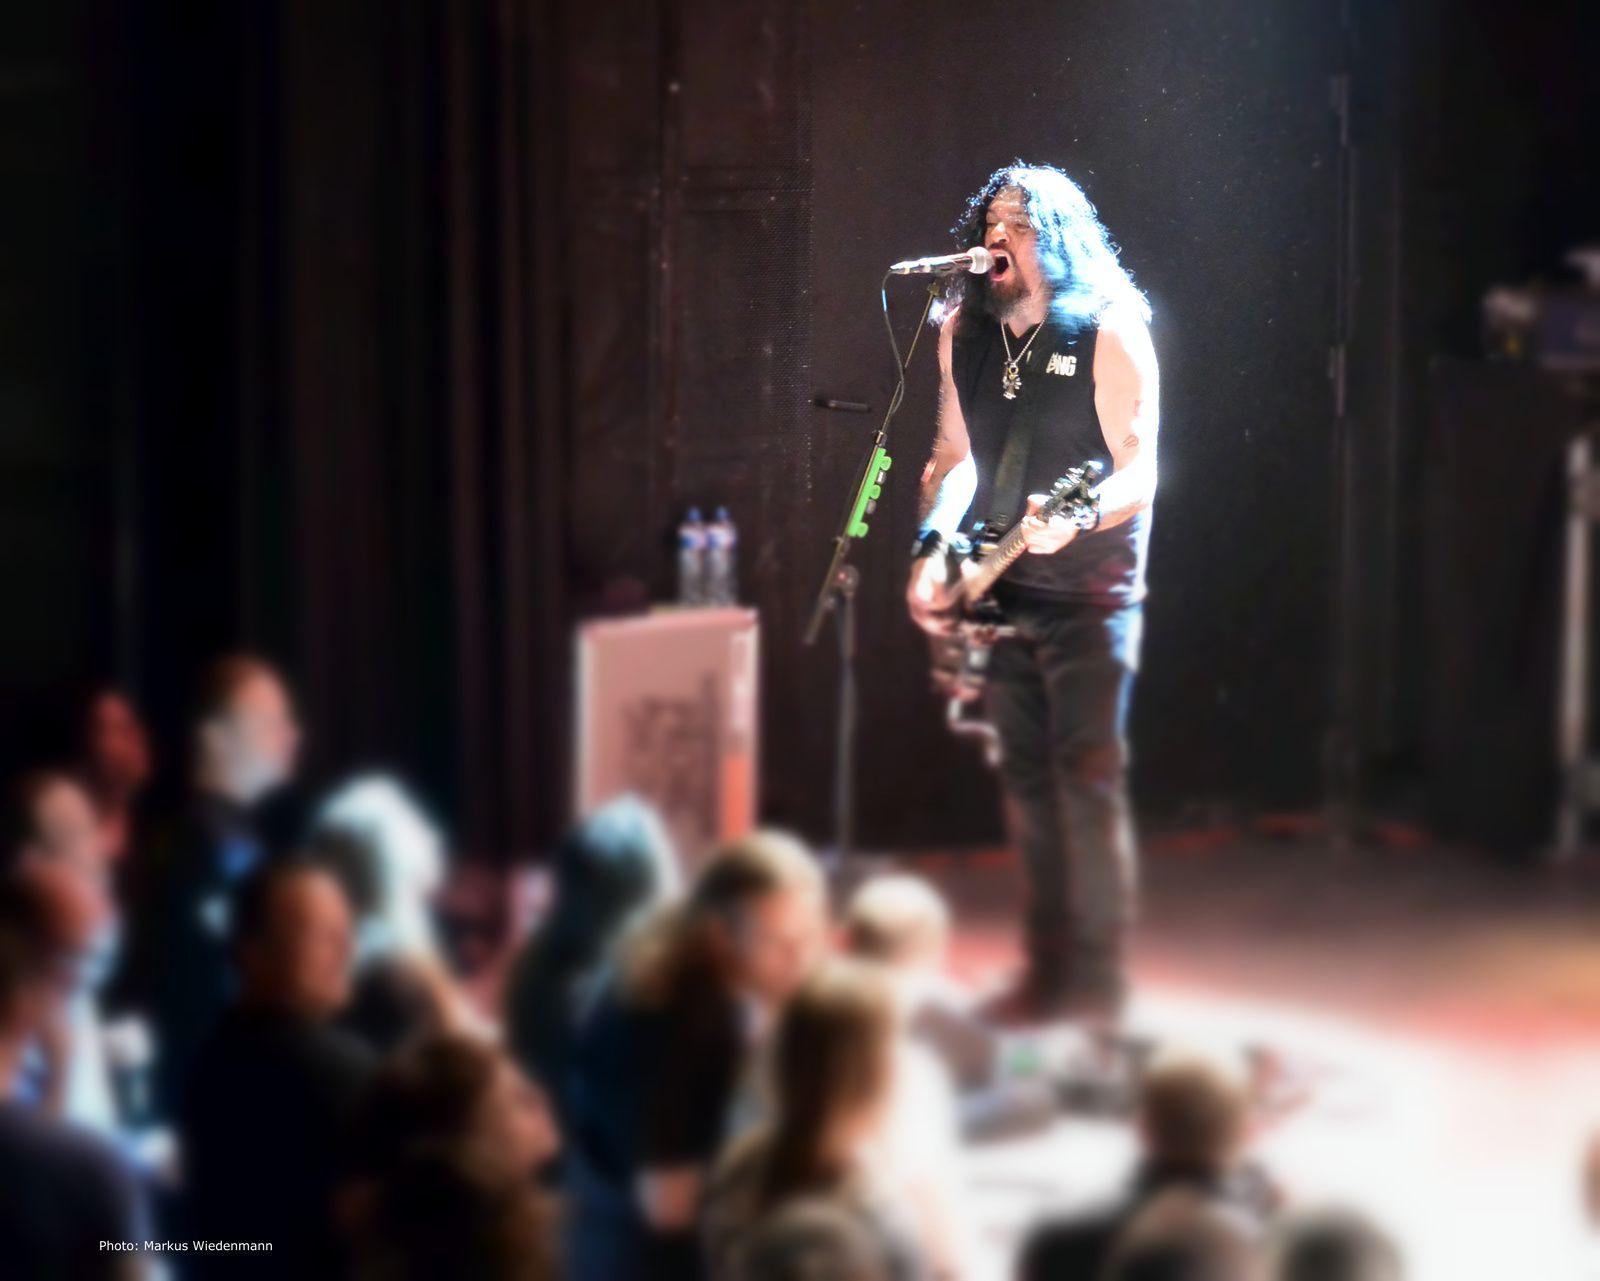 Live review PRONG/KLOGR, Patronaat, Haarlem 27.03.2014